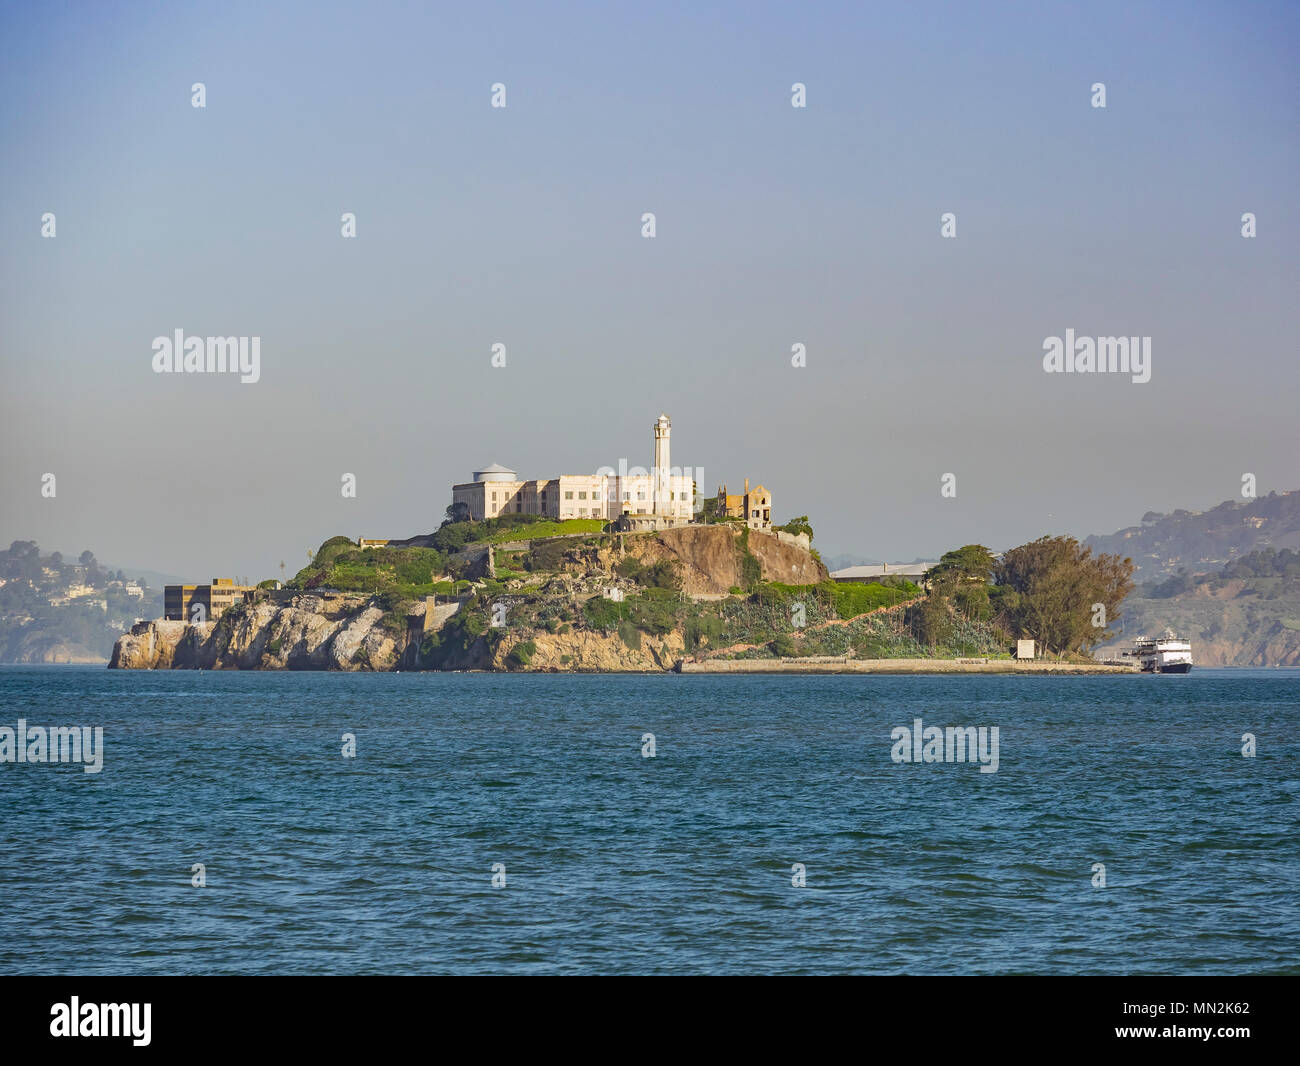 Die berühmten und wunderschönen Insel Alcatraz in San Francisco Stockbild